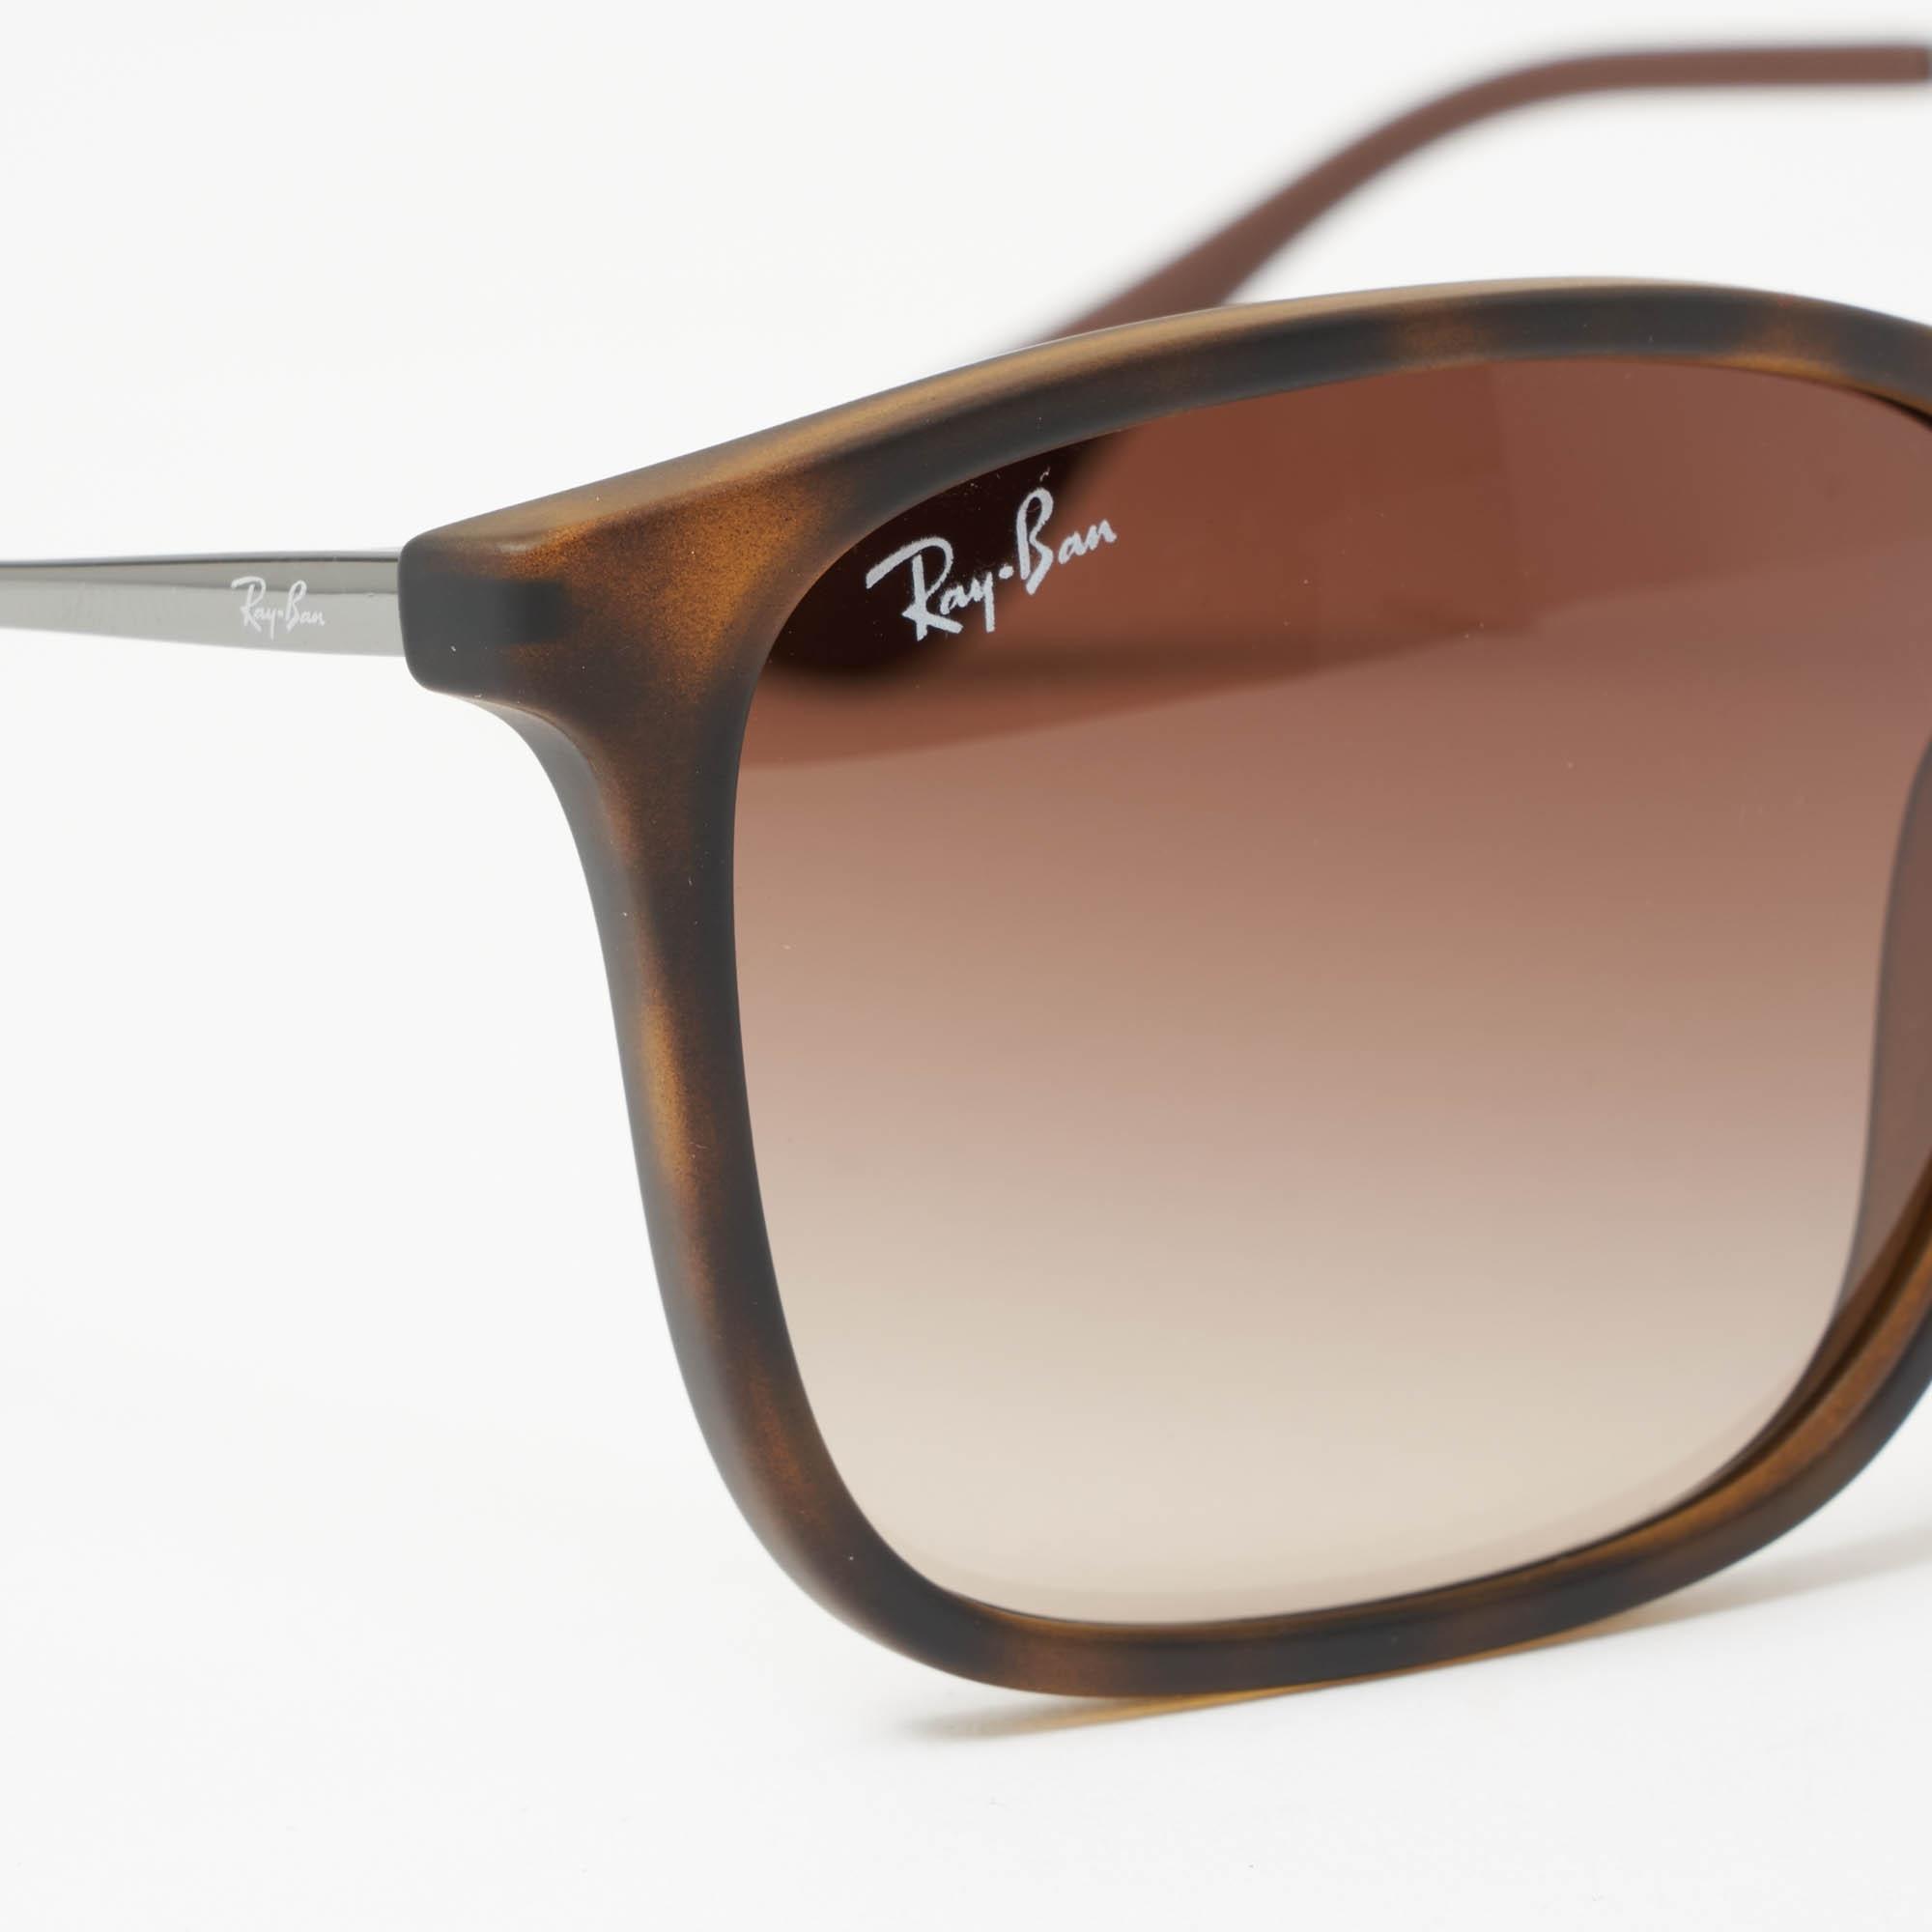 015c964506 Tortoise Chris Sunglasses - Brown Gradient Lenses